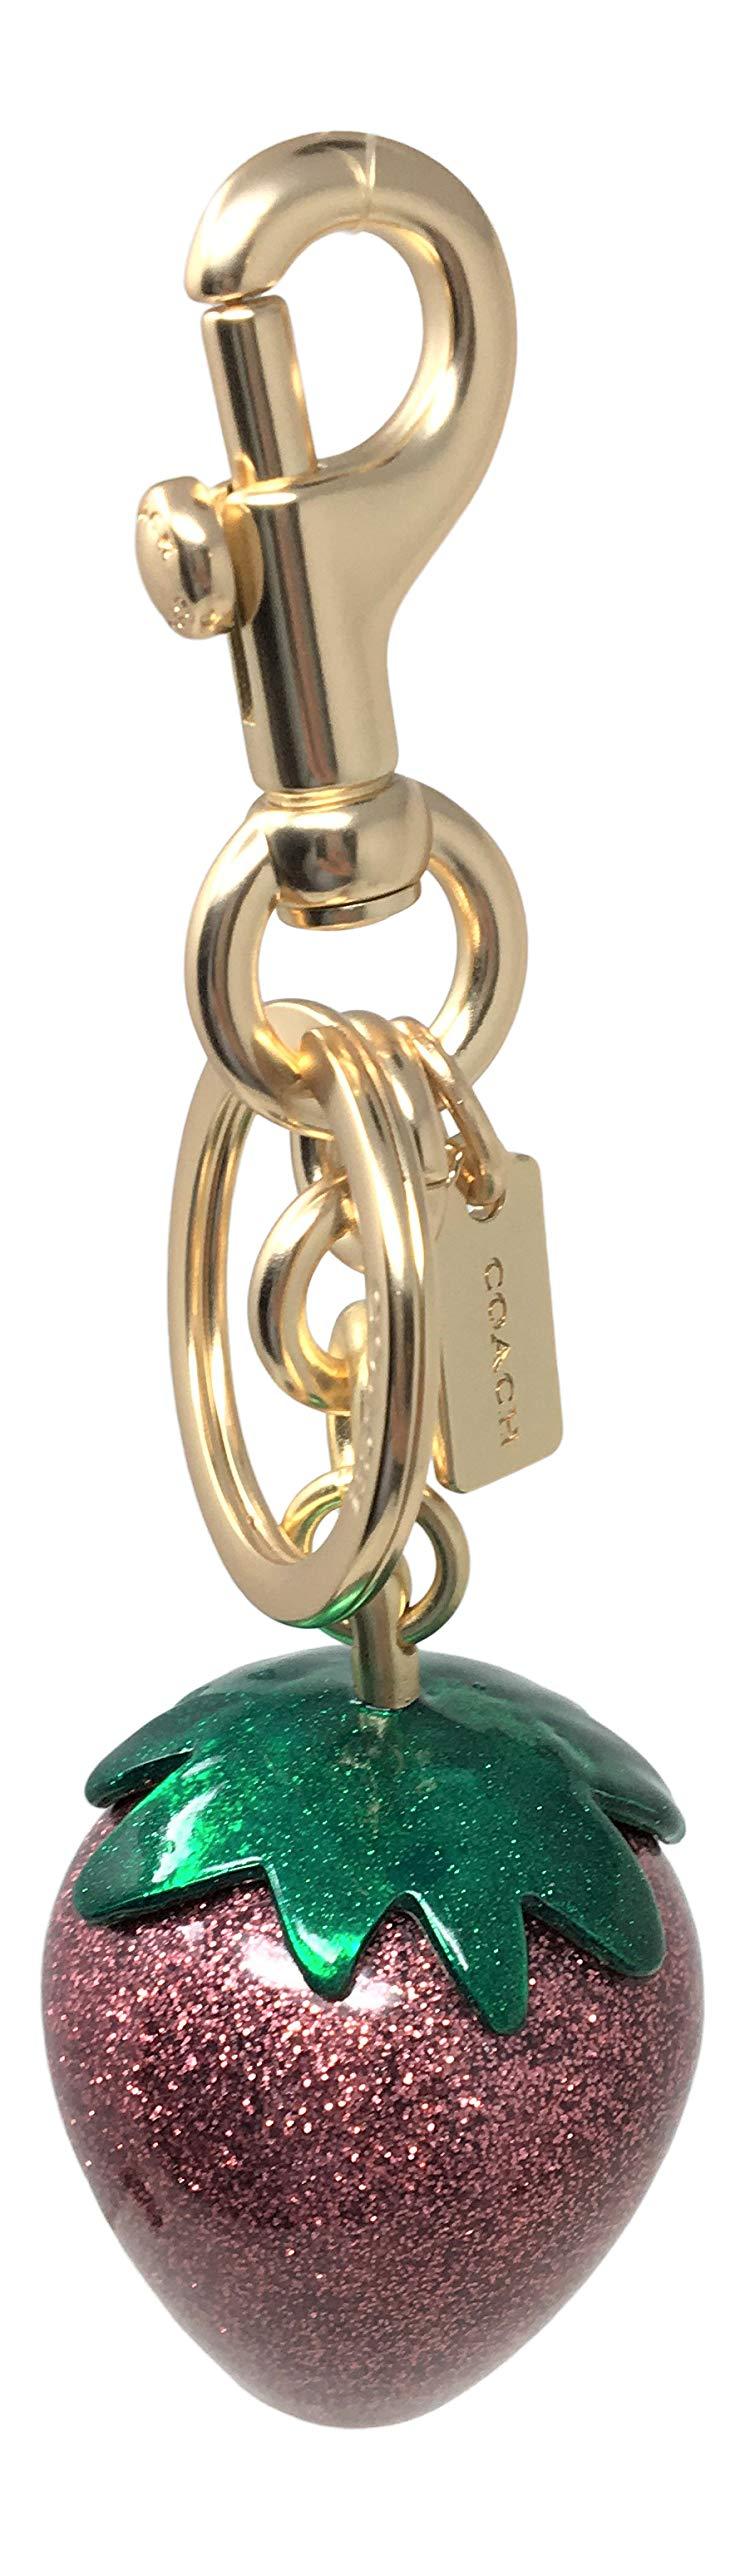 Coach Strawberry Bag Charm Key Chain Pink Gold F68418